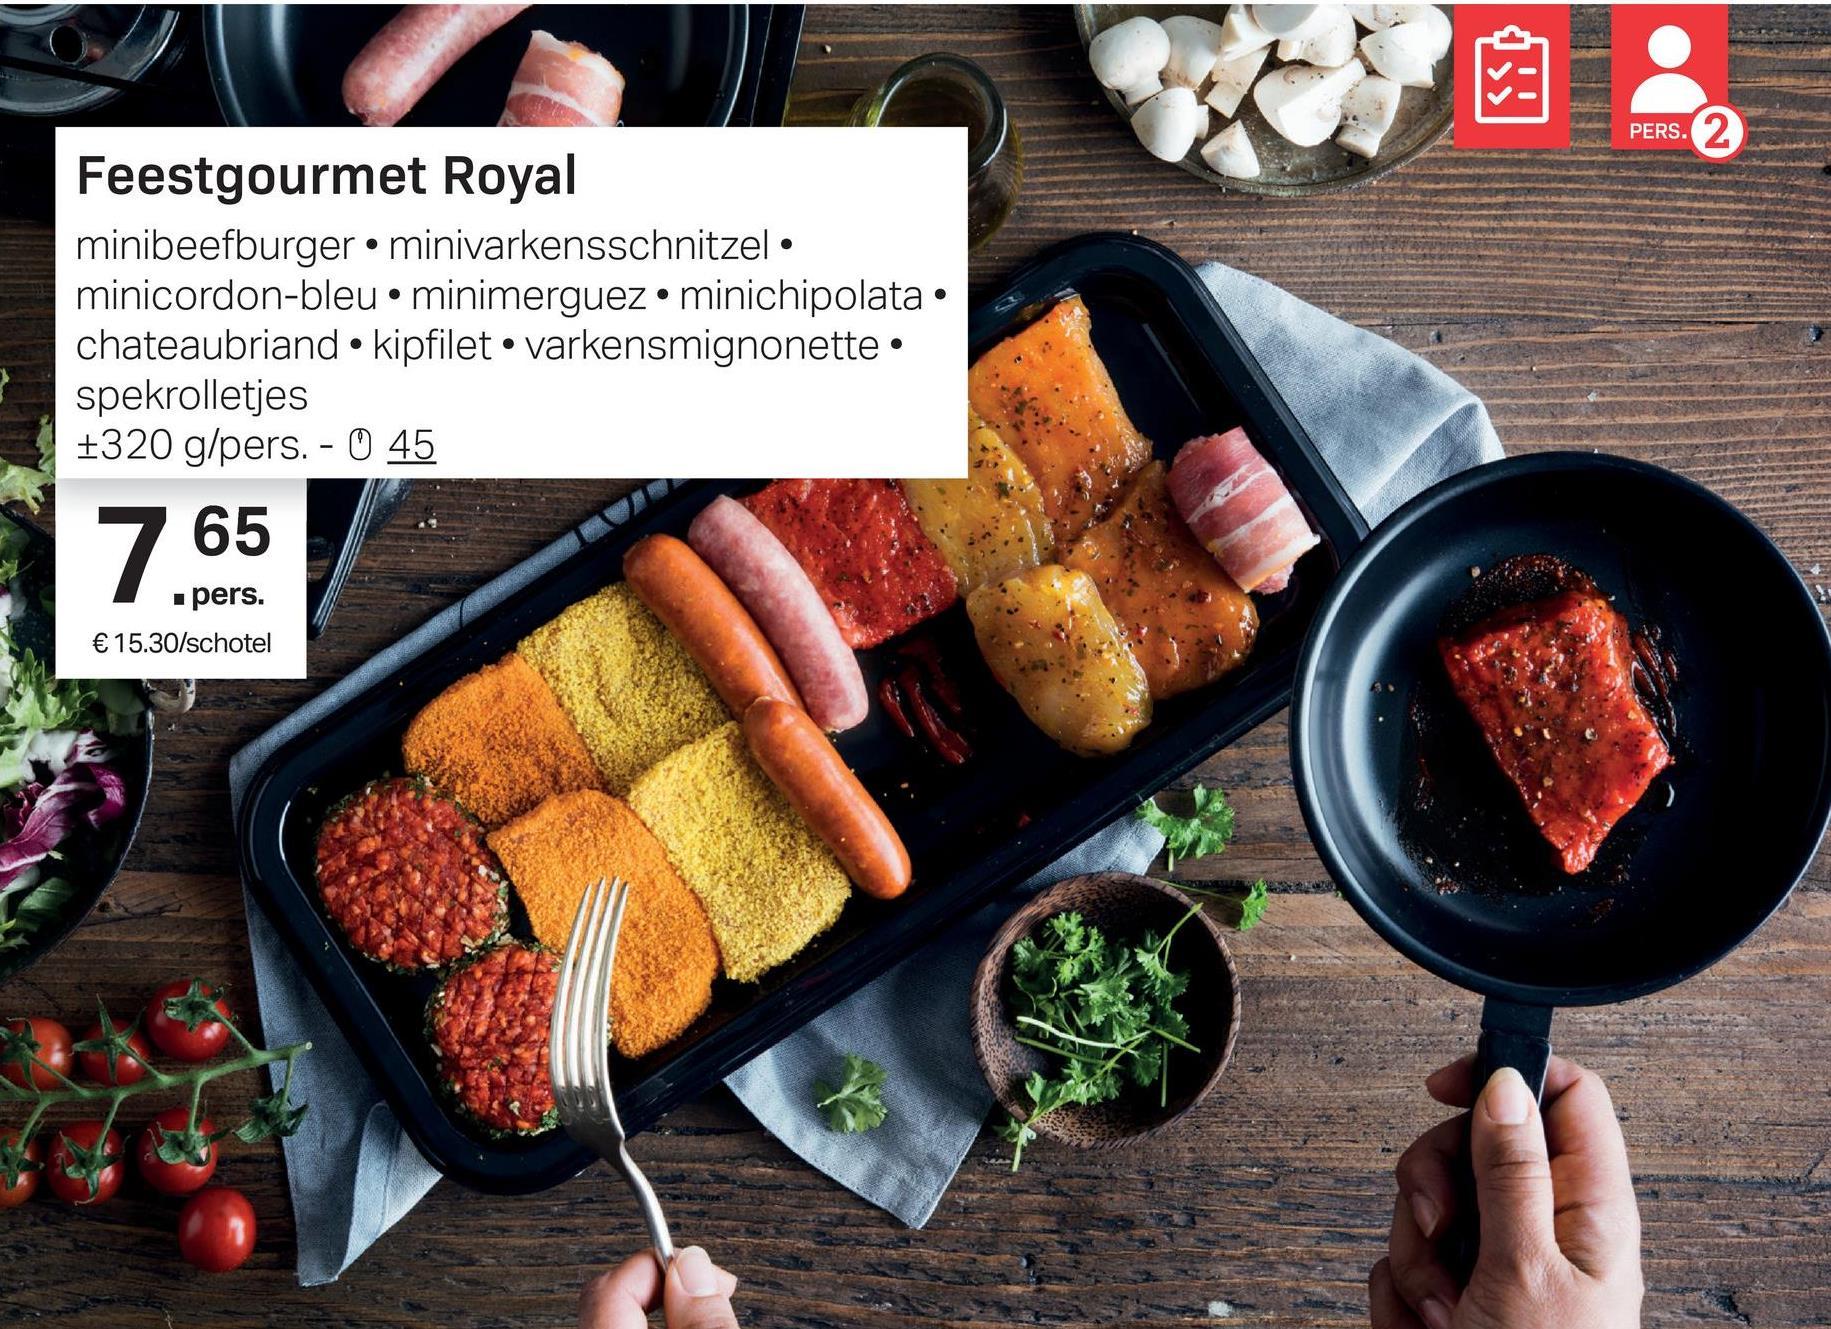 PERS. Feestgourmet Royal minibeefburger • minivarkensschnitzel • minicordon-bleu.minimerguez• minichipolata • chateaubriand · kipfilet • varkensmignonette • spekrolletjes +320 g/pers. - 0 45 65 pers. € 15.30/schotel